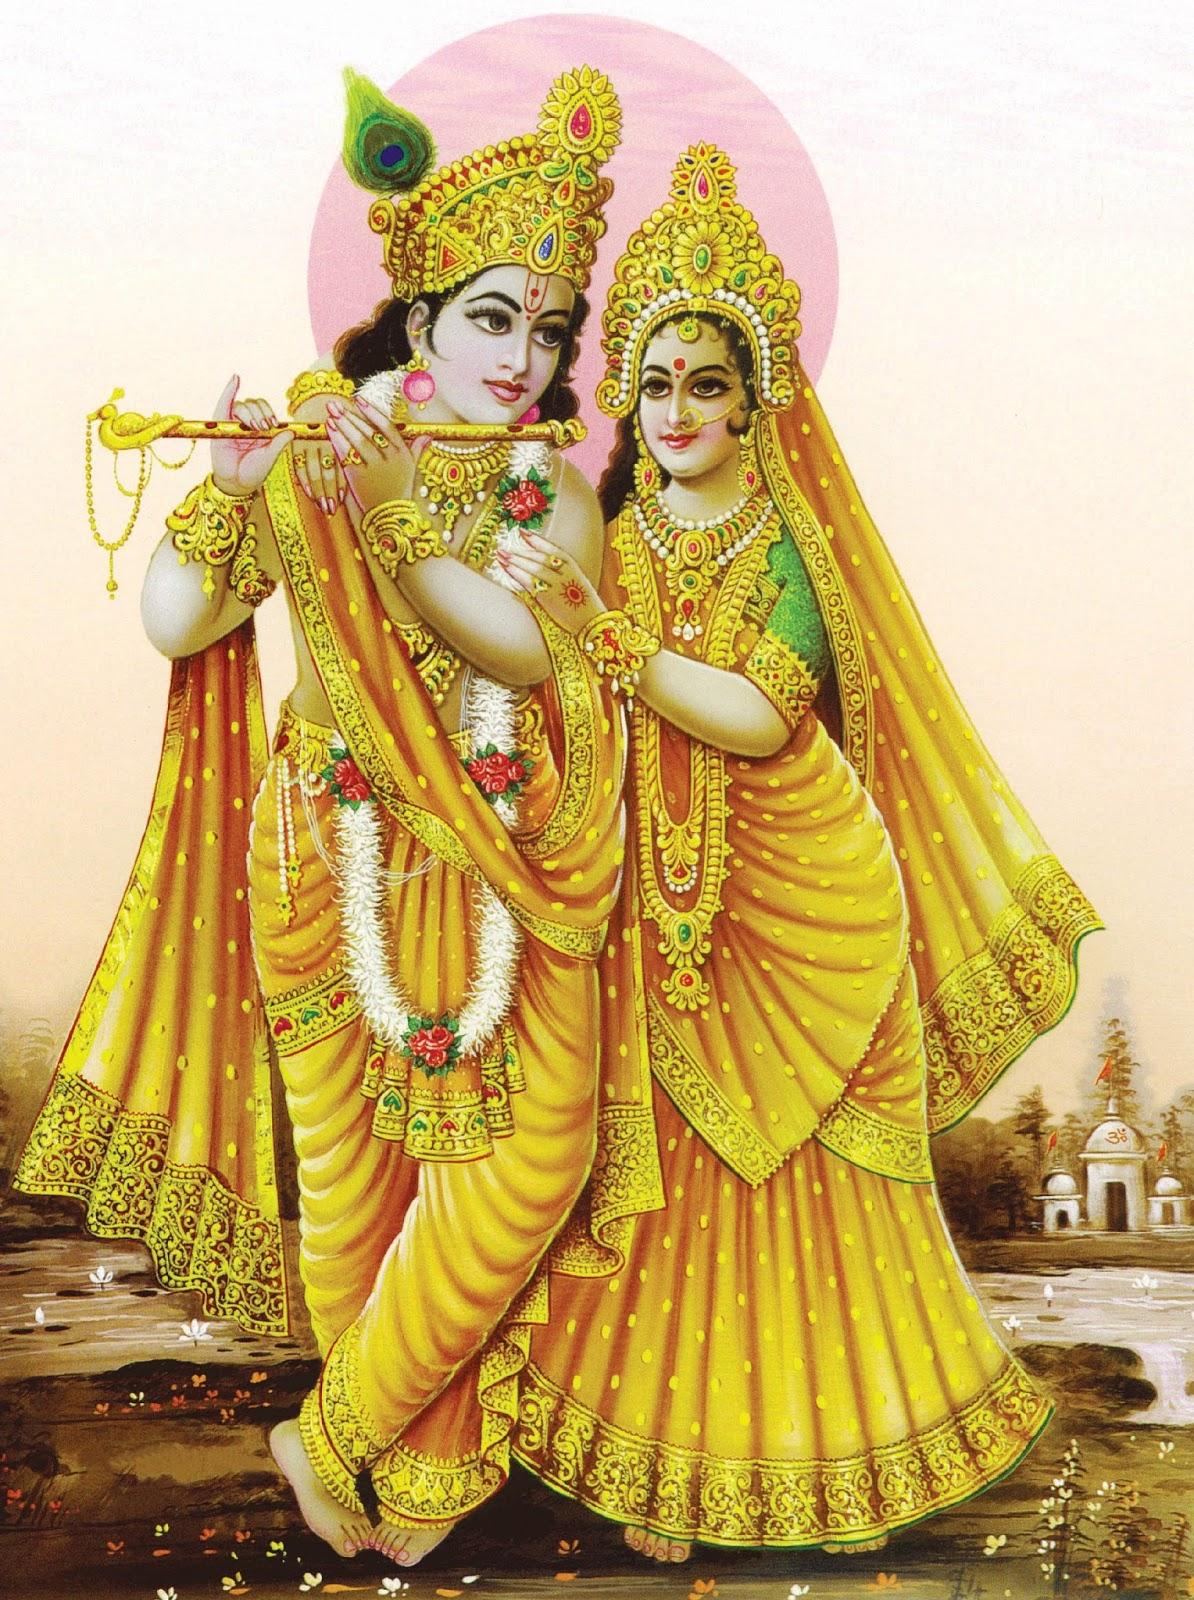 Radha Krishna.jpg (1194×1600) - Radha Krishna, Transparent background PNG HD thumbnail